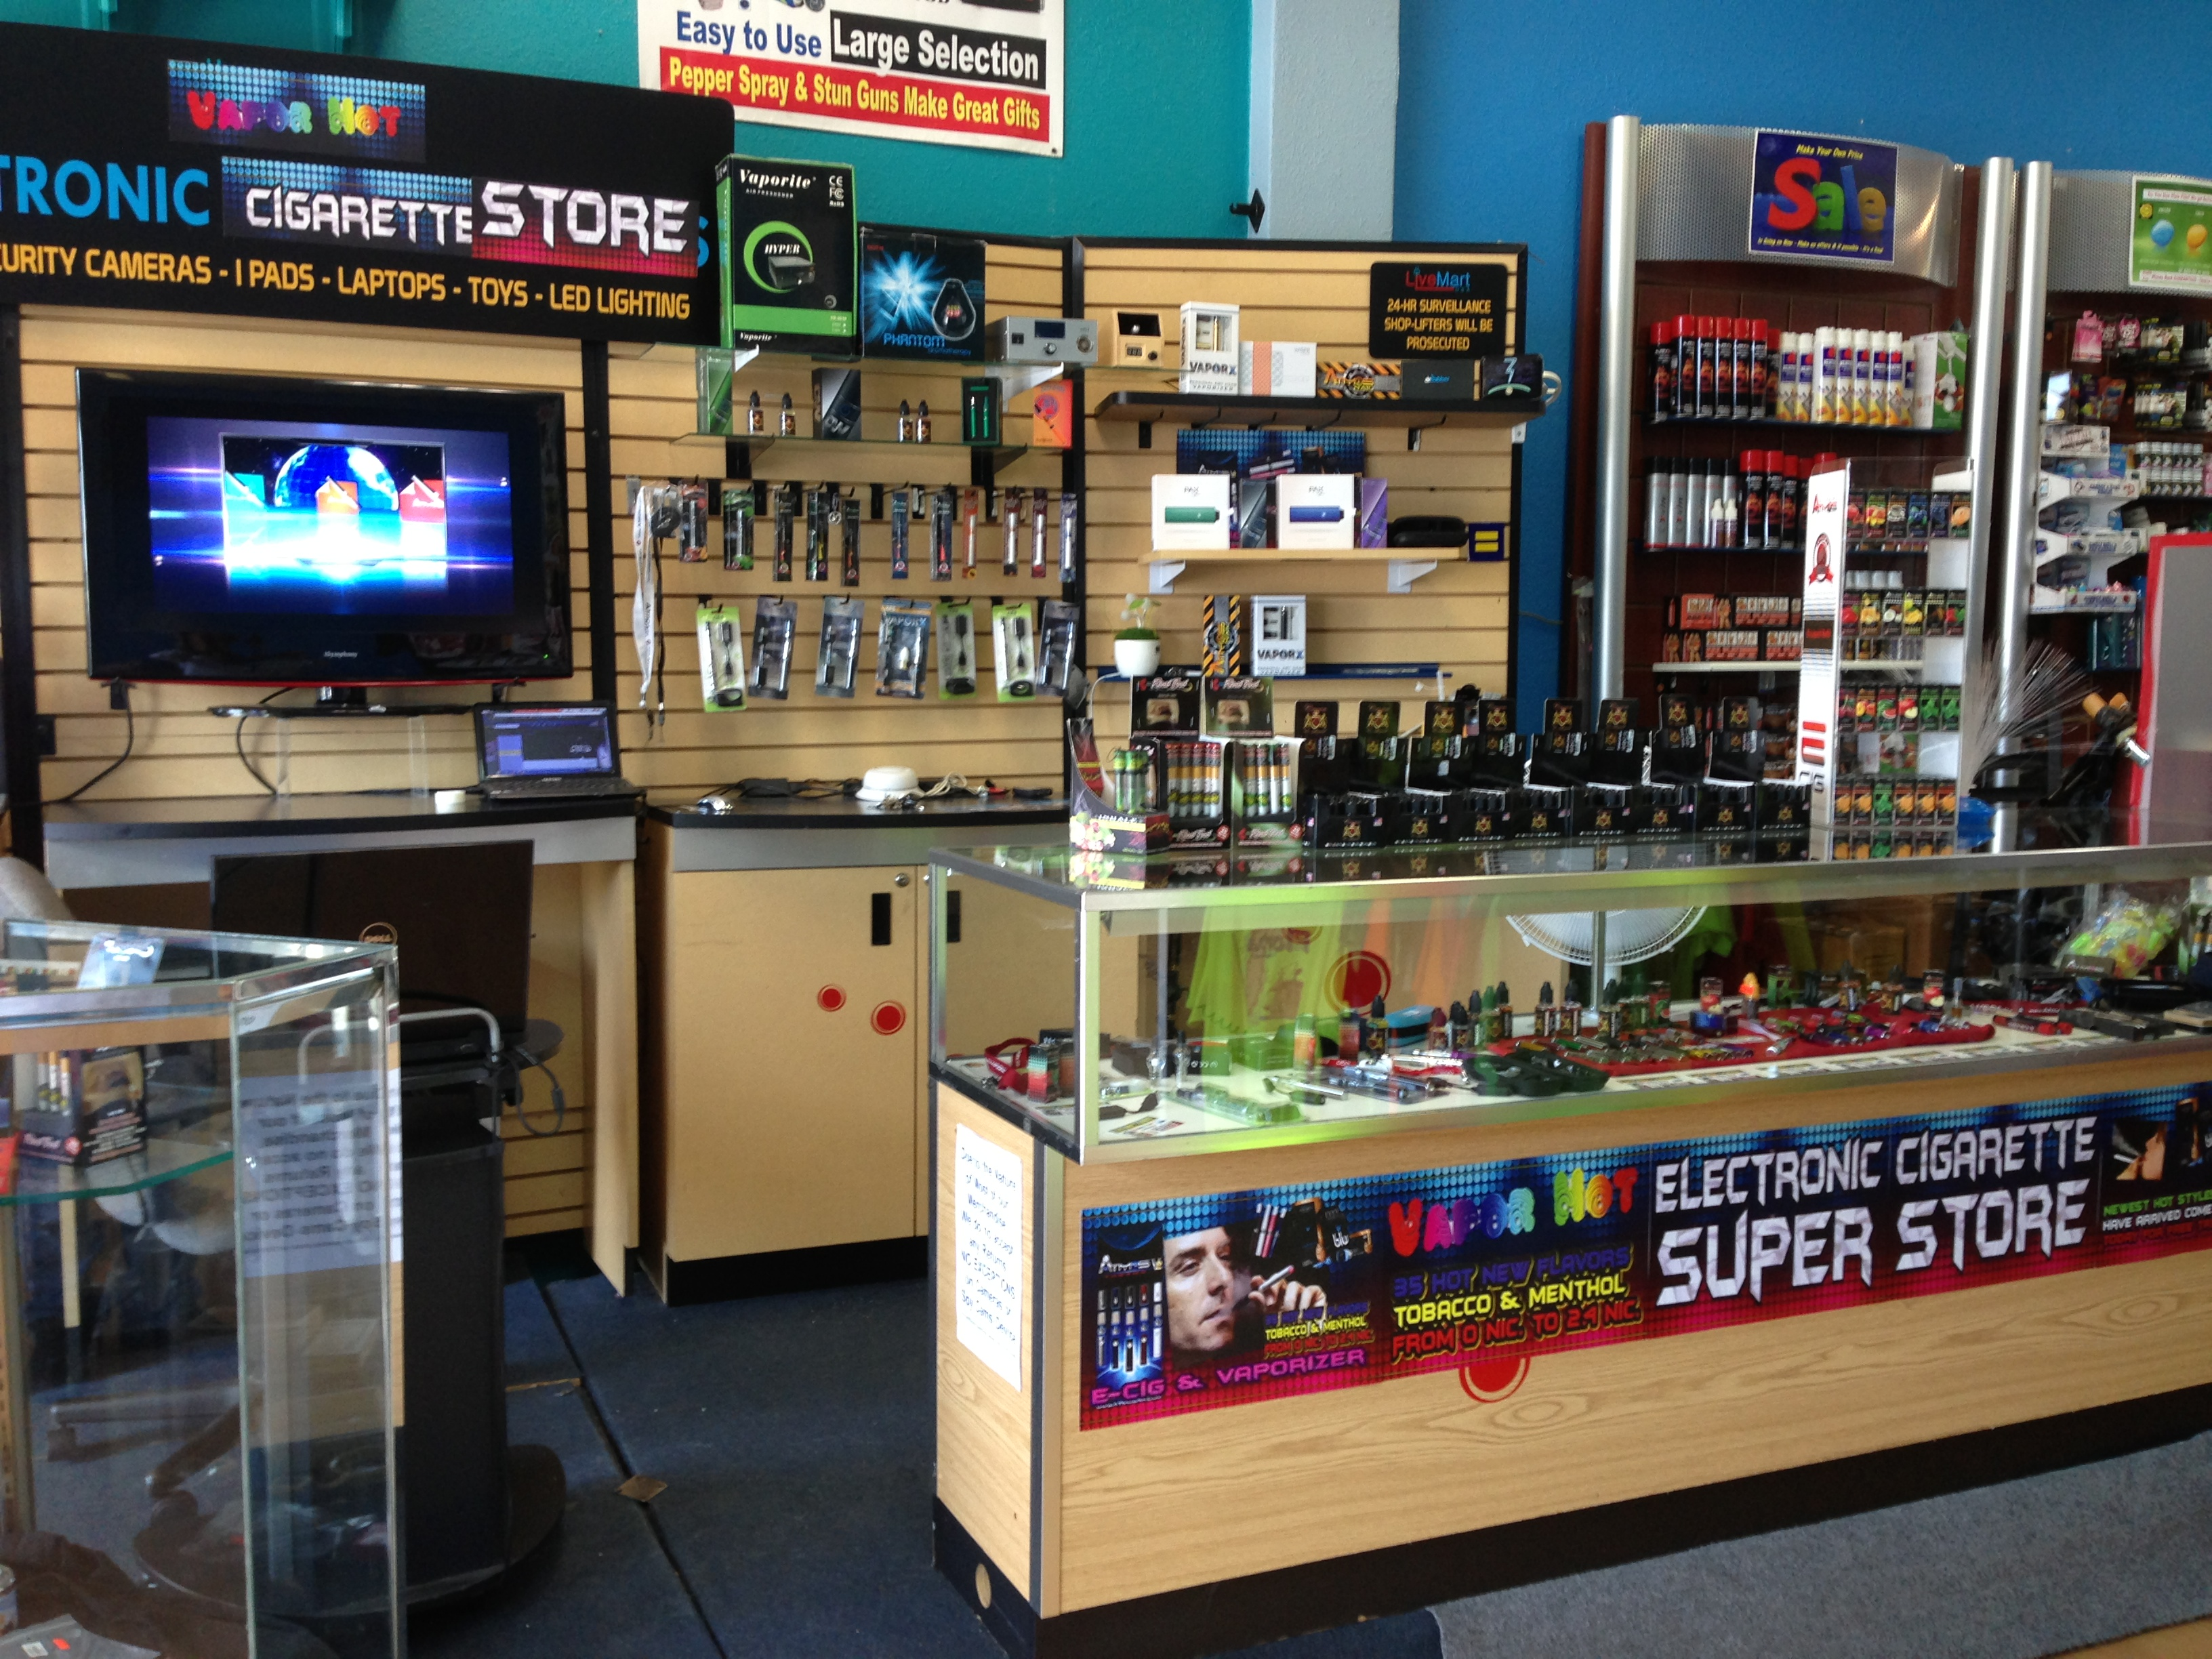 Electronic cigarettes mall kiosk